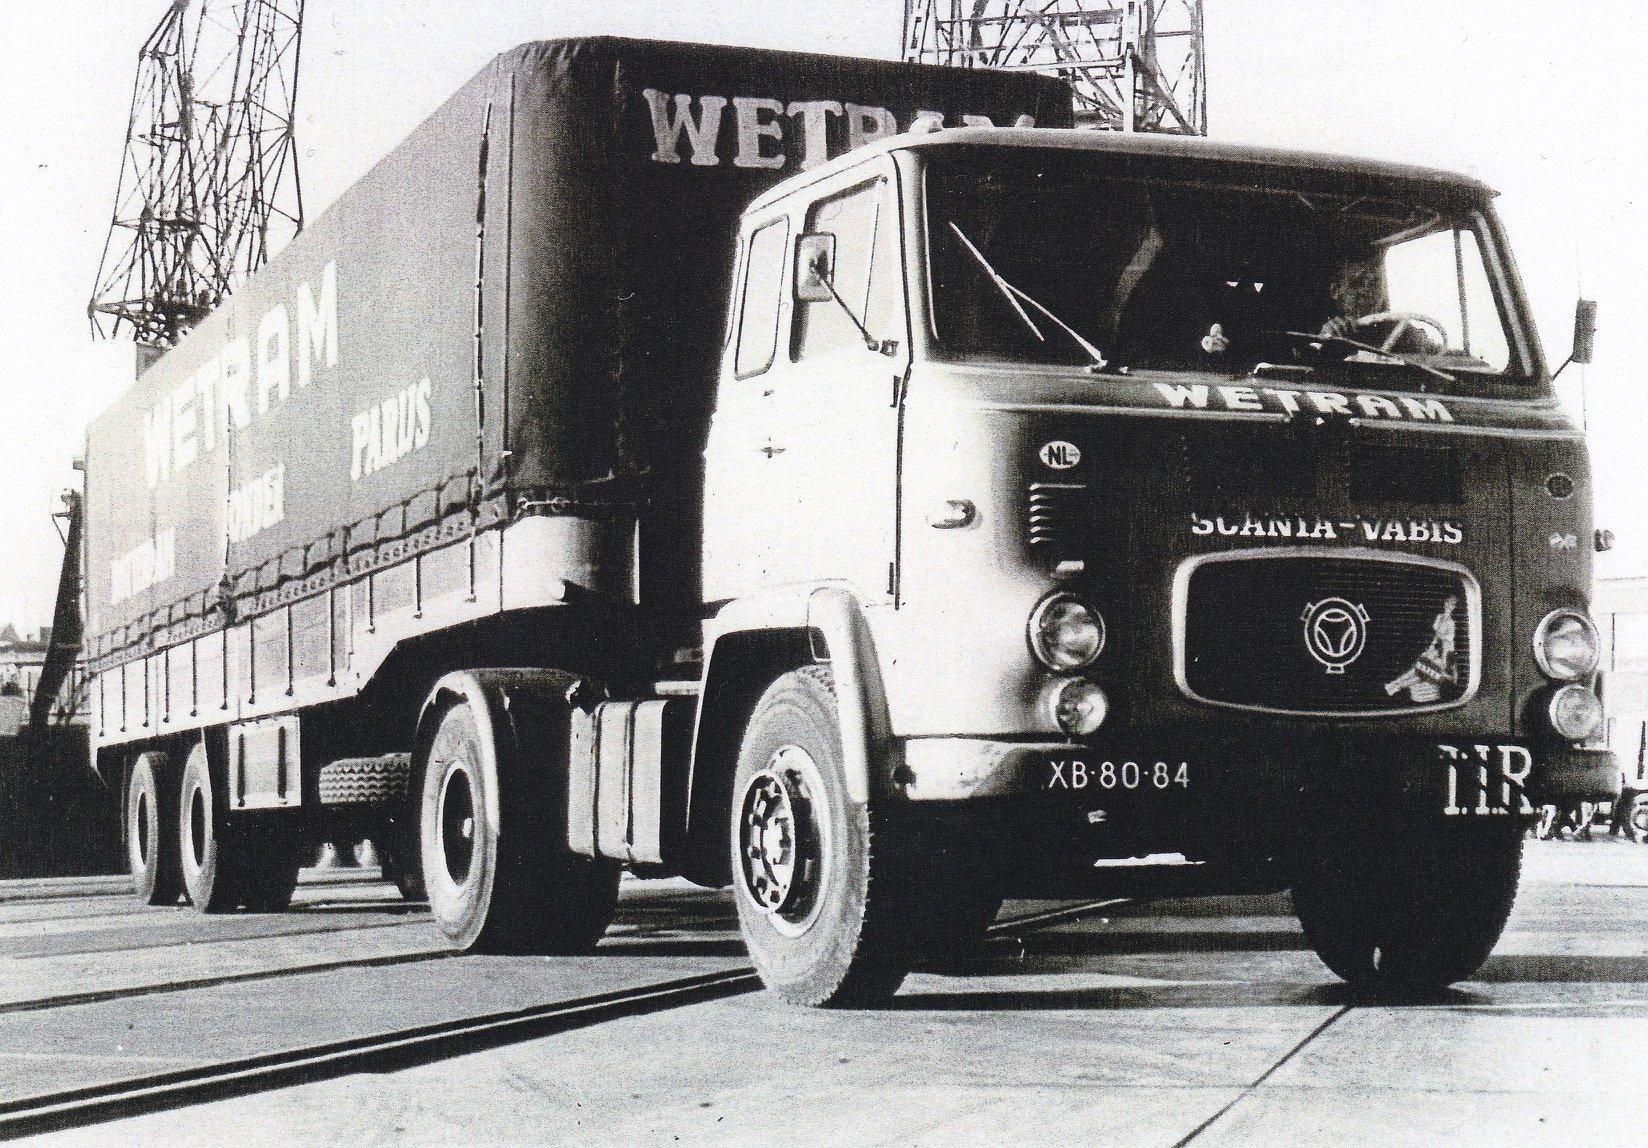 Scania-Vabis-LV-76--XB-80-84-